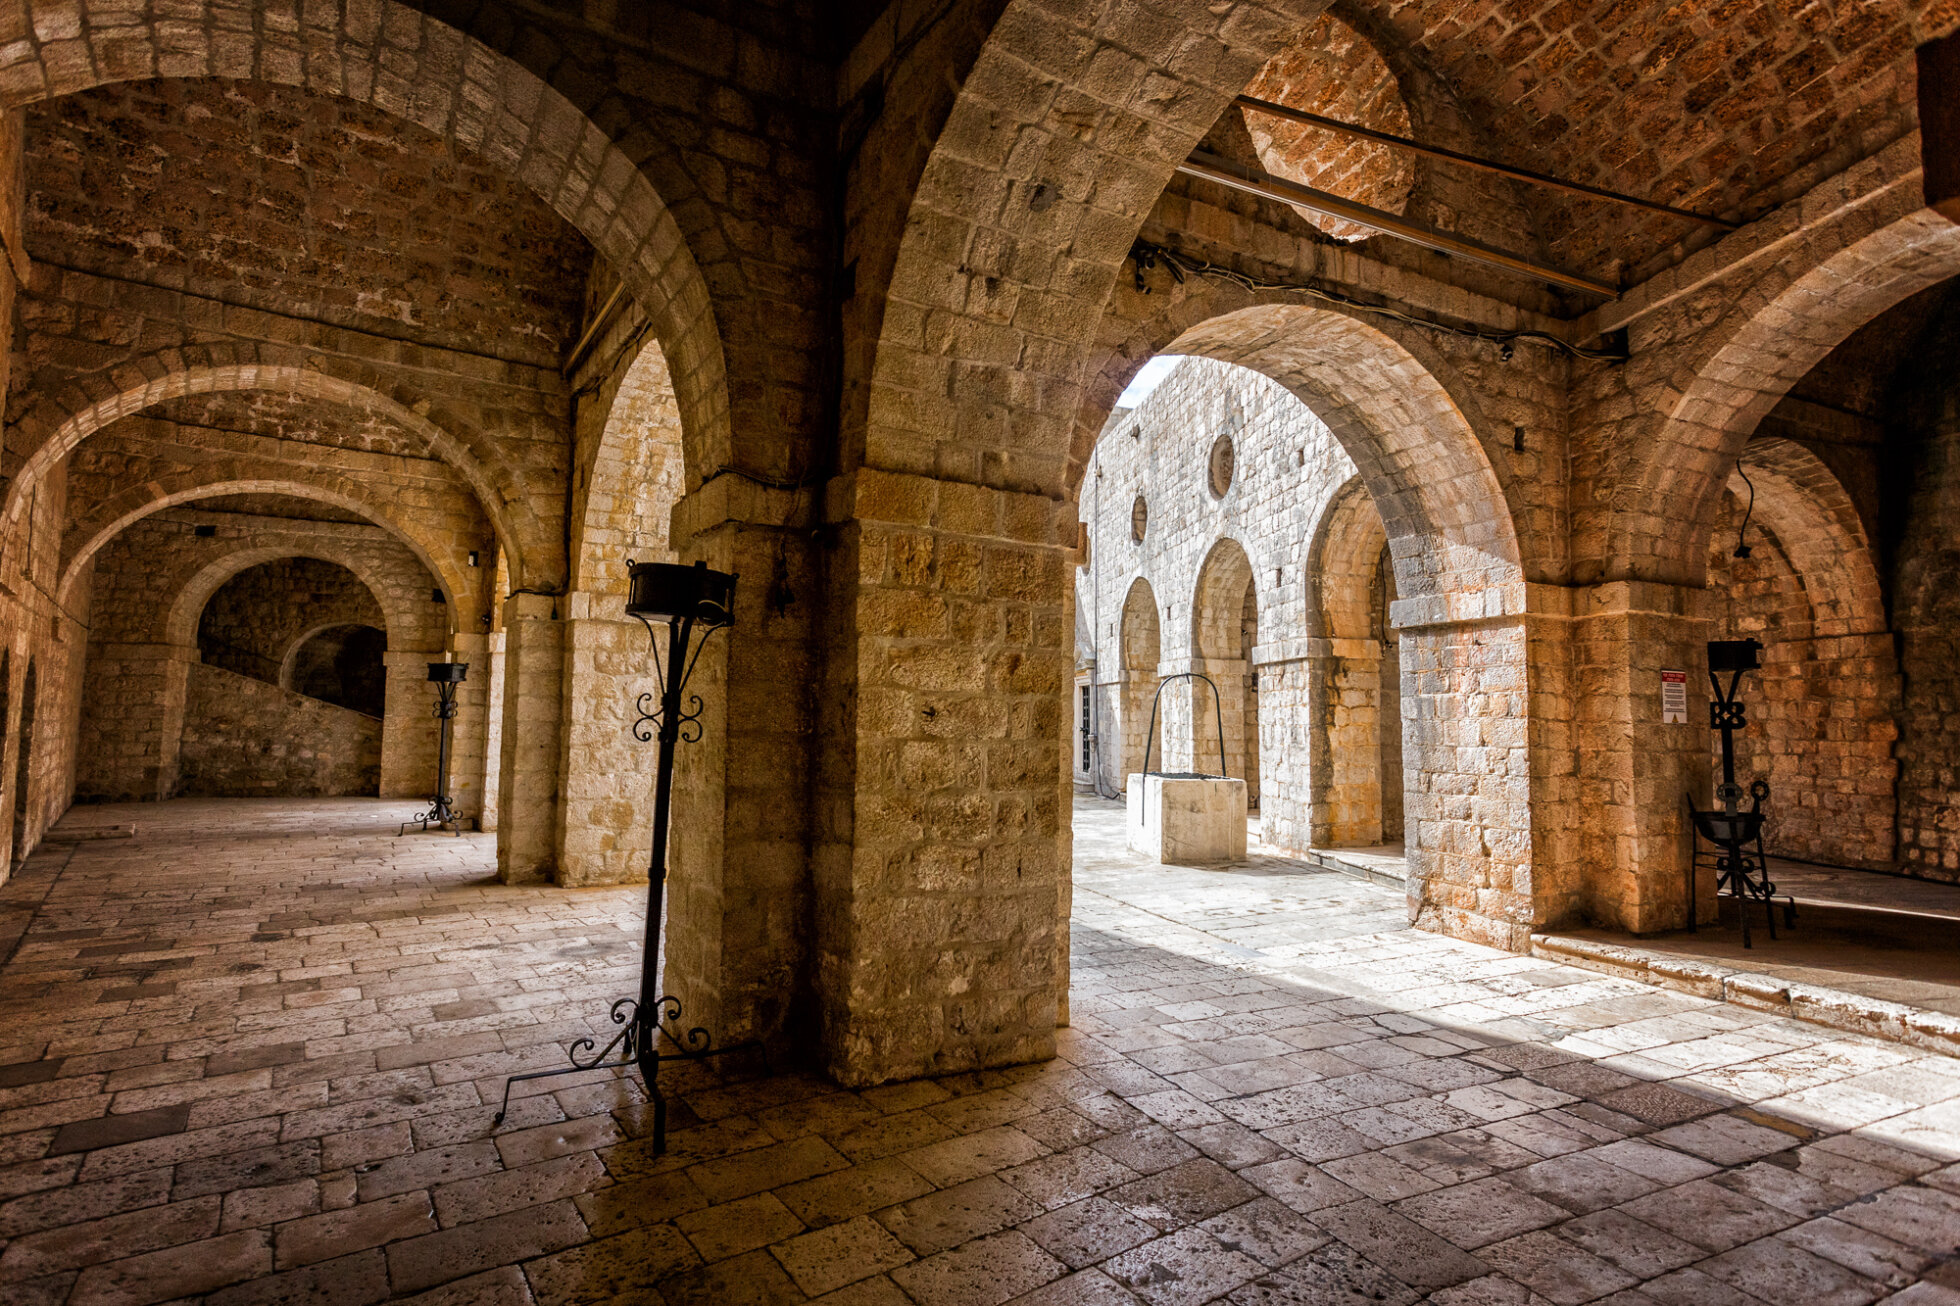 Red Keep Interior in King's Landing - Dubrovnik (original location: Lovrijenac castle)